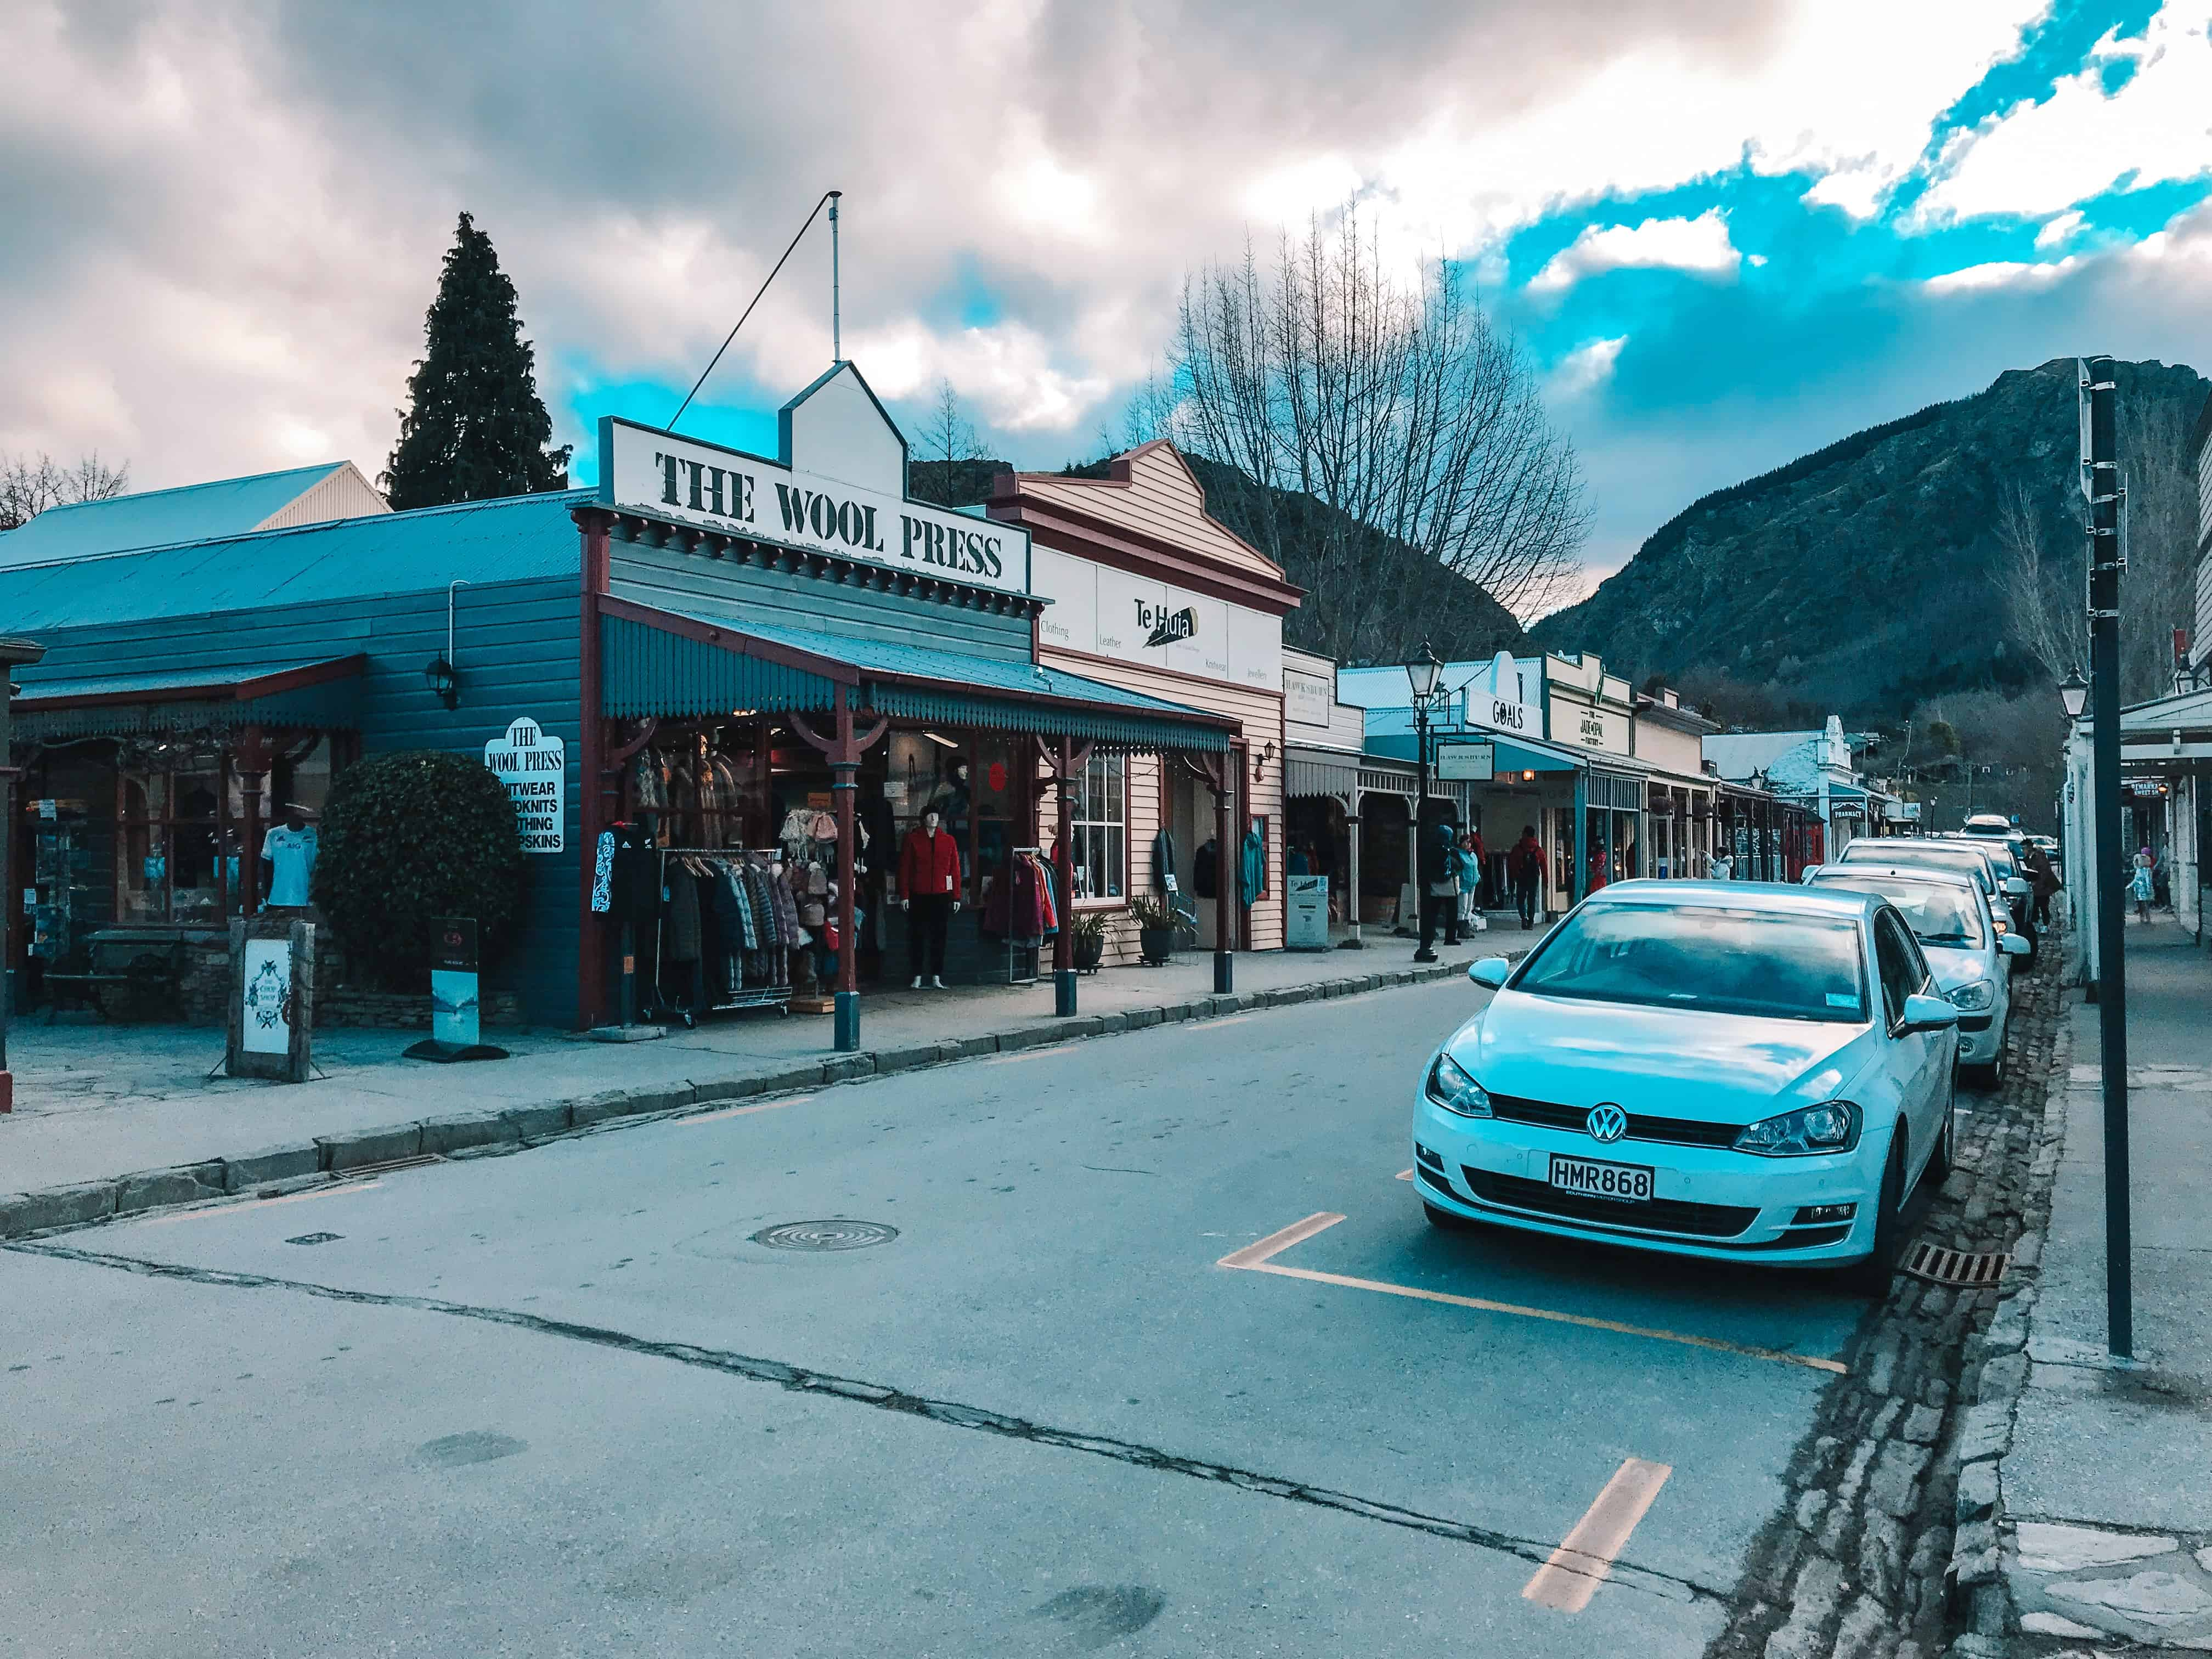 Arrowtown - New Zealand South Island Winter itinerary